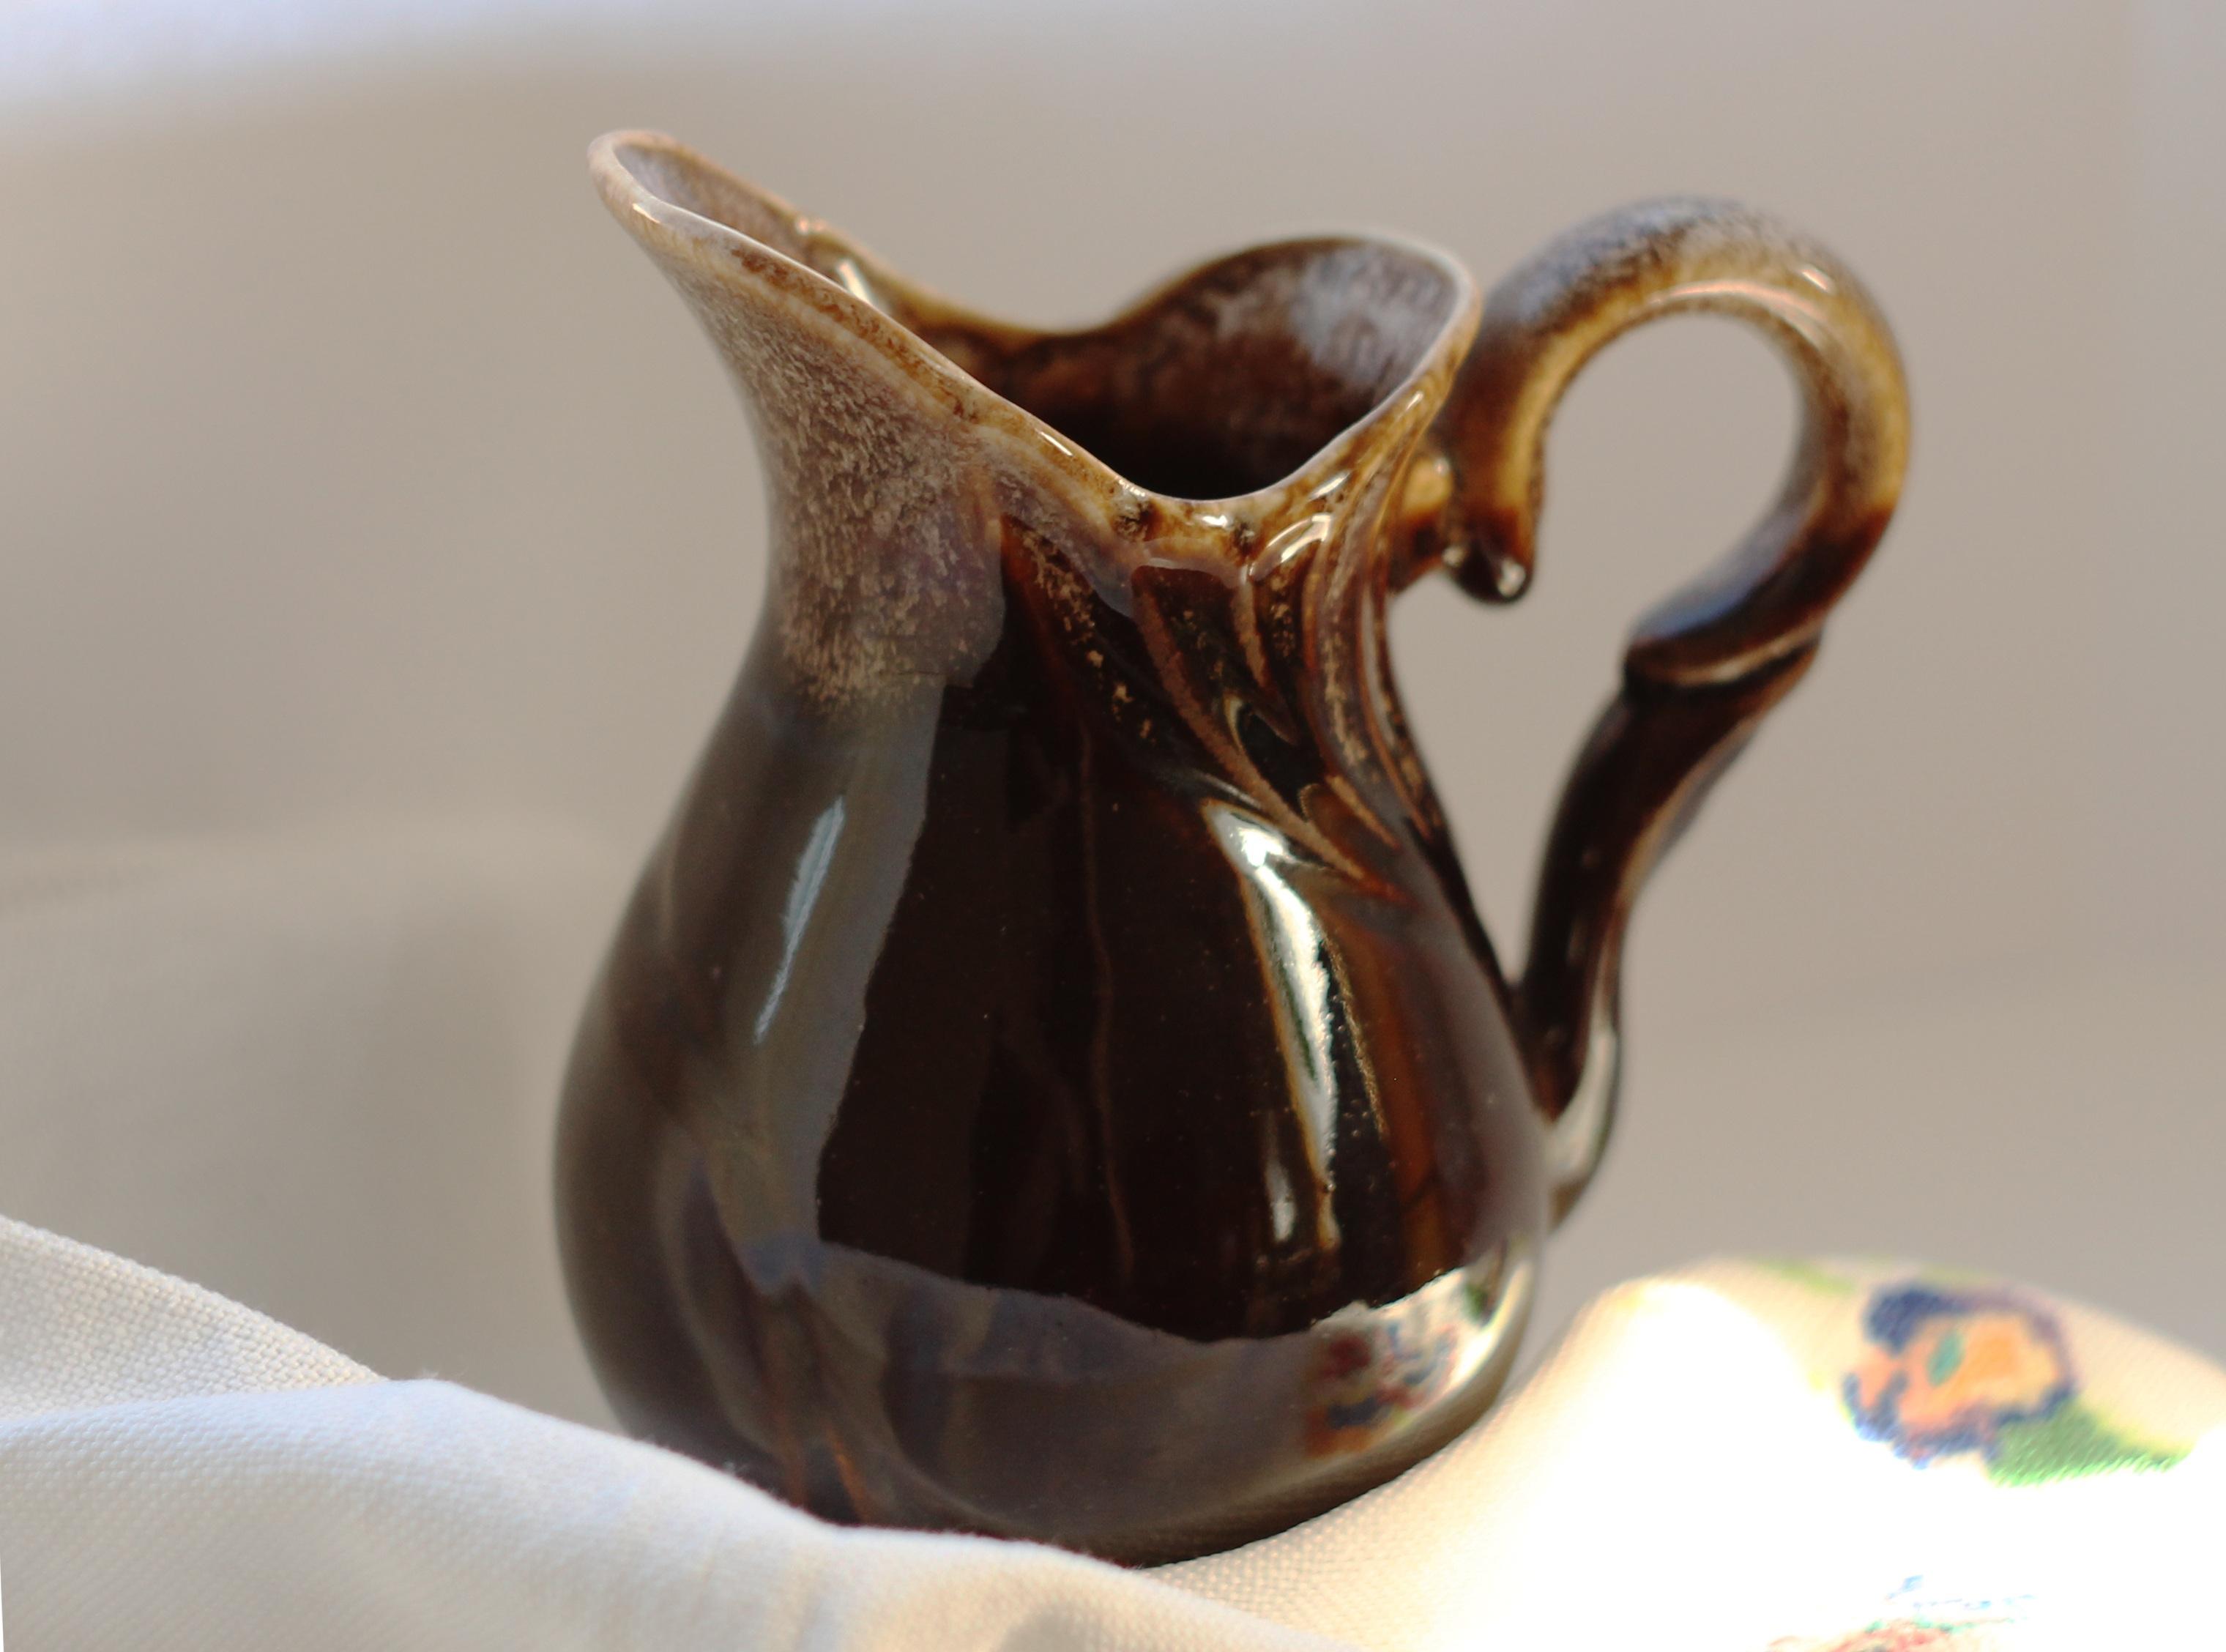 Glass Teapot Cup Vase Decoration Ceramic Brown Kitchen Pottery Tableware  Material Jug Art Pitcher Porcelain Crockery